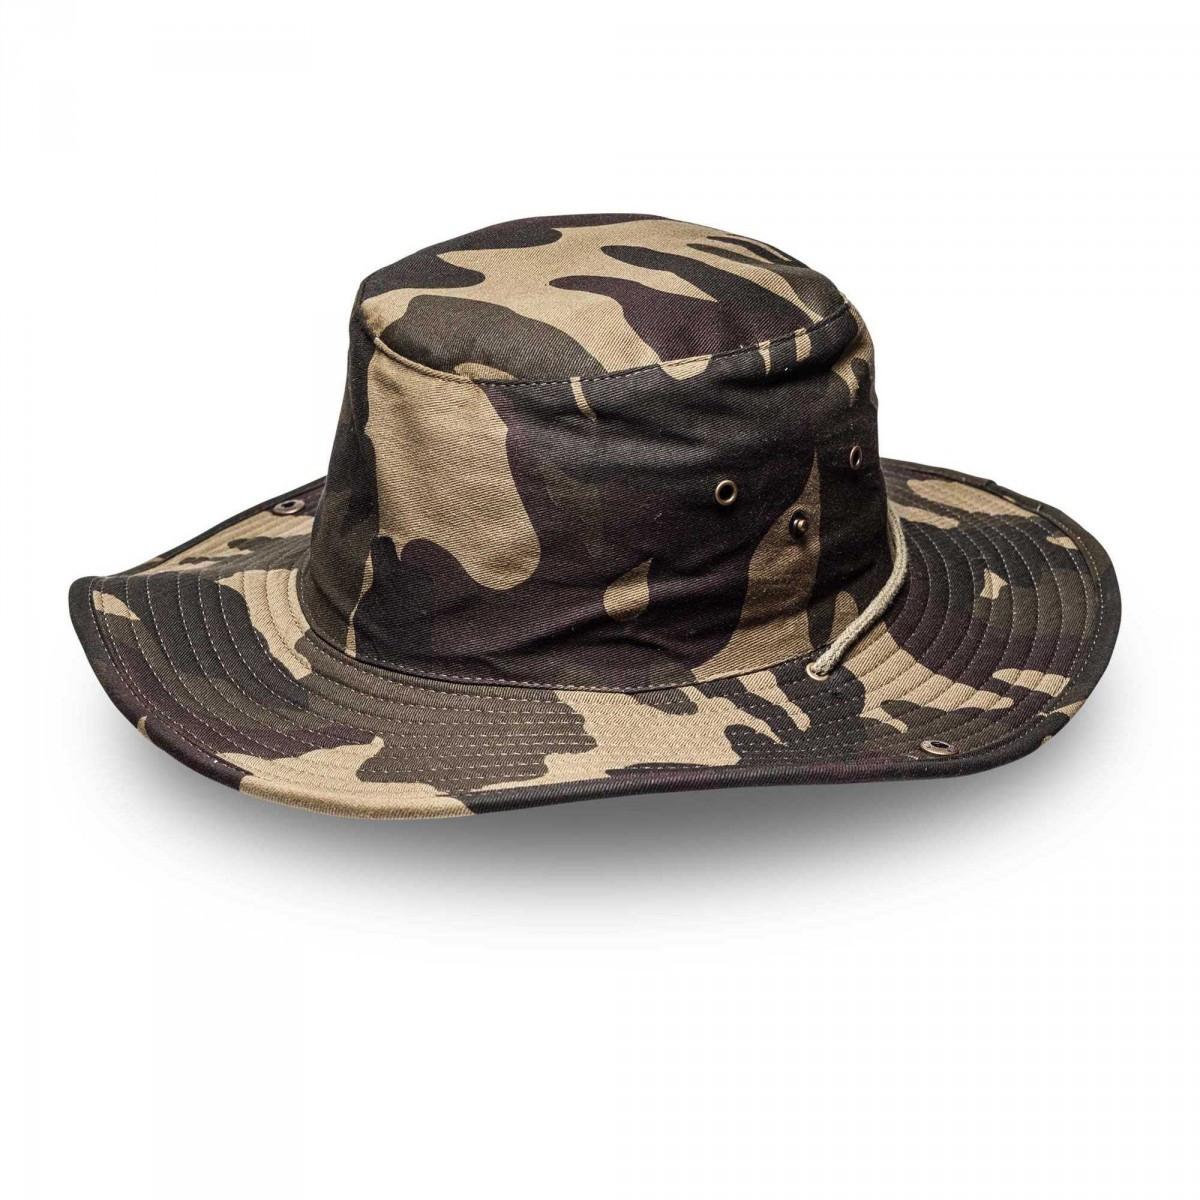 c554667ab3 Kiddies Camo Wide Brim Safari Hat